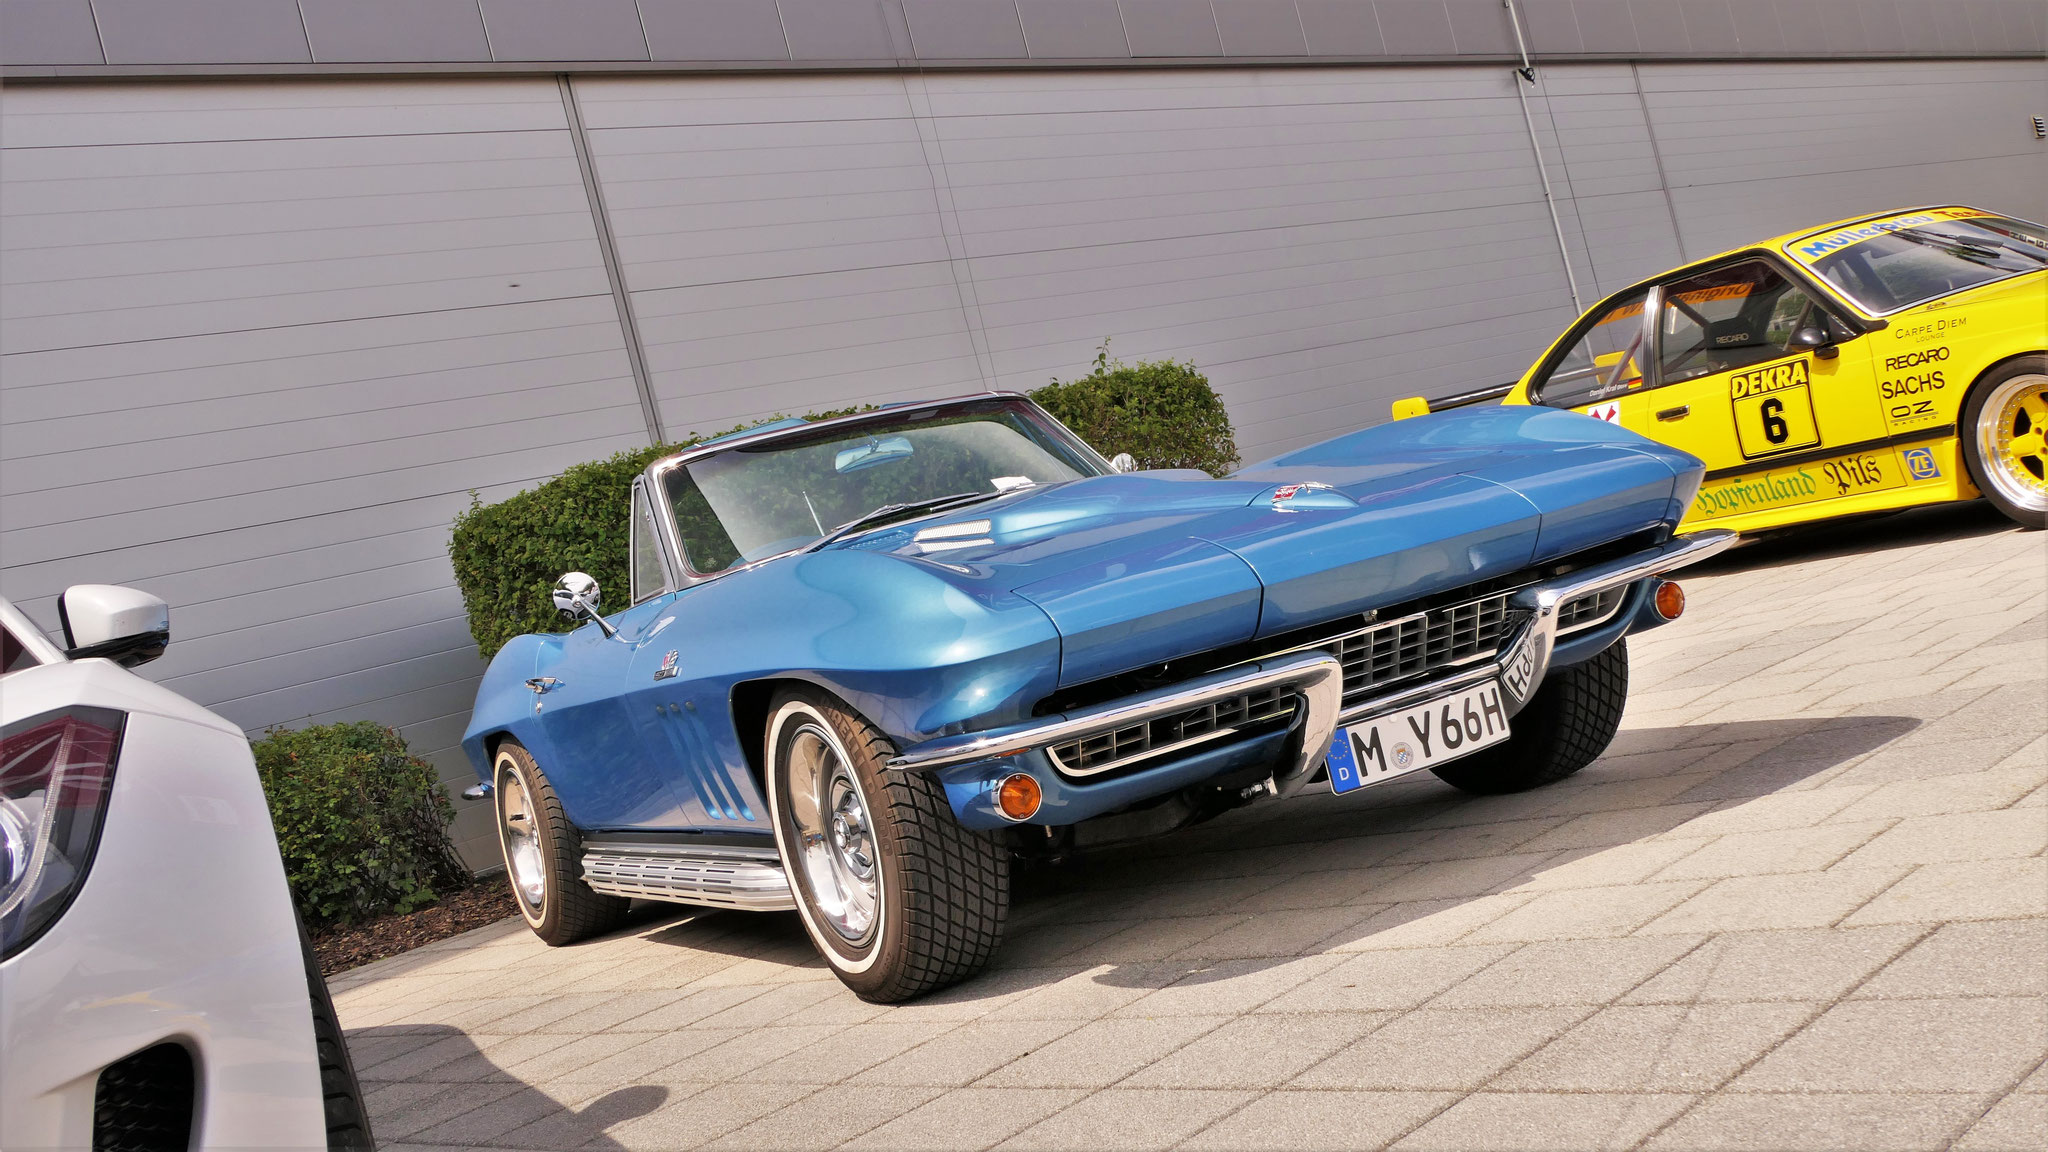 Chevrolet Corvette C2 - M-Y-66H